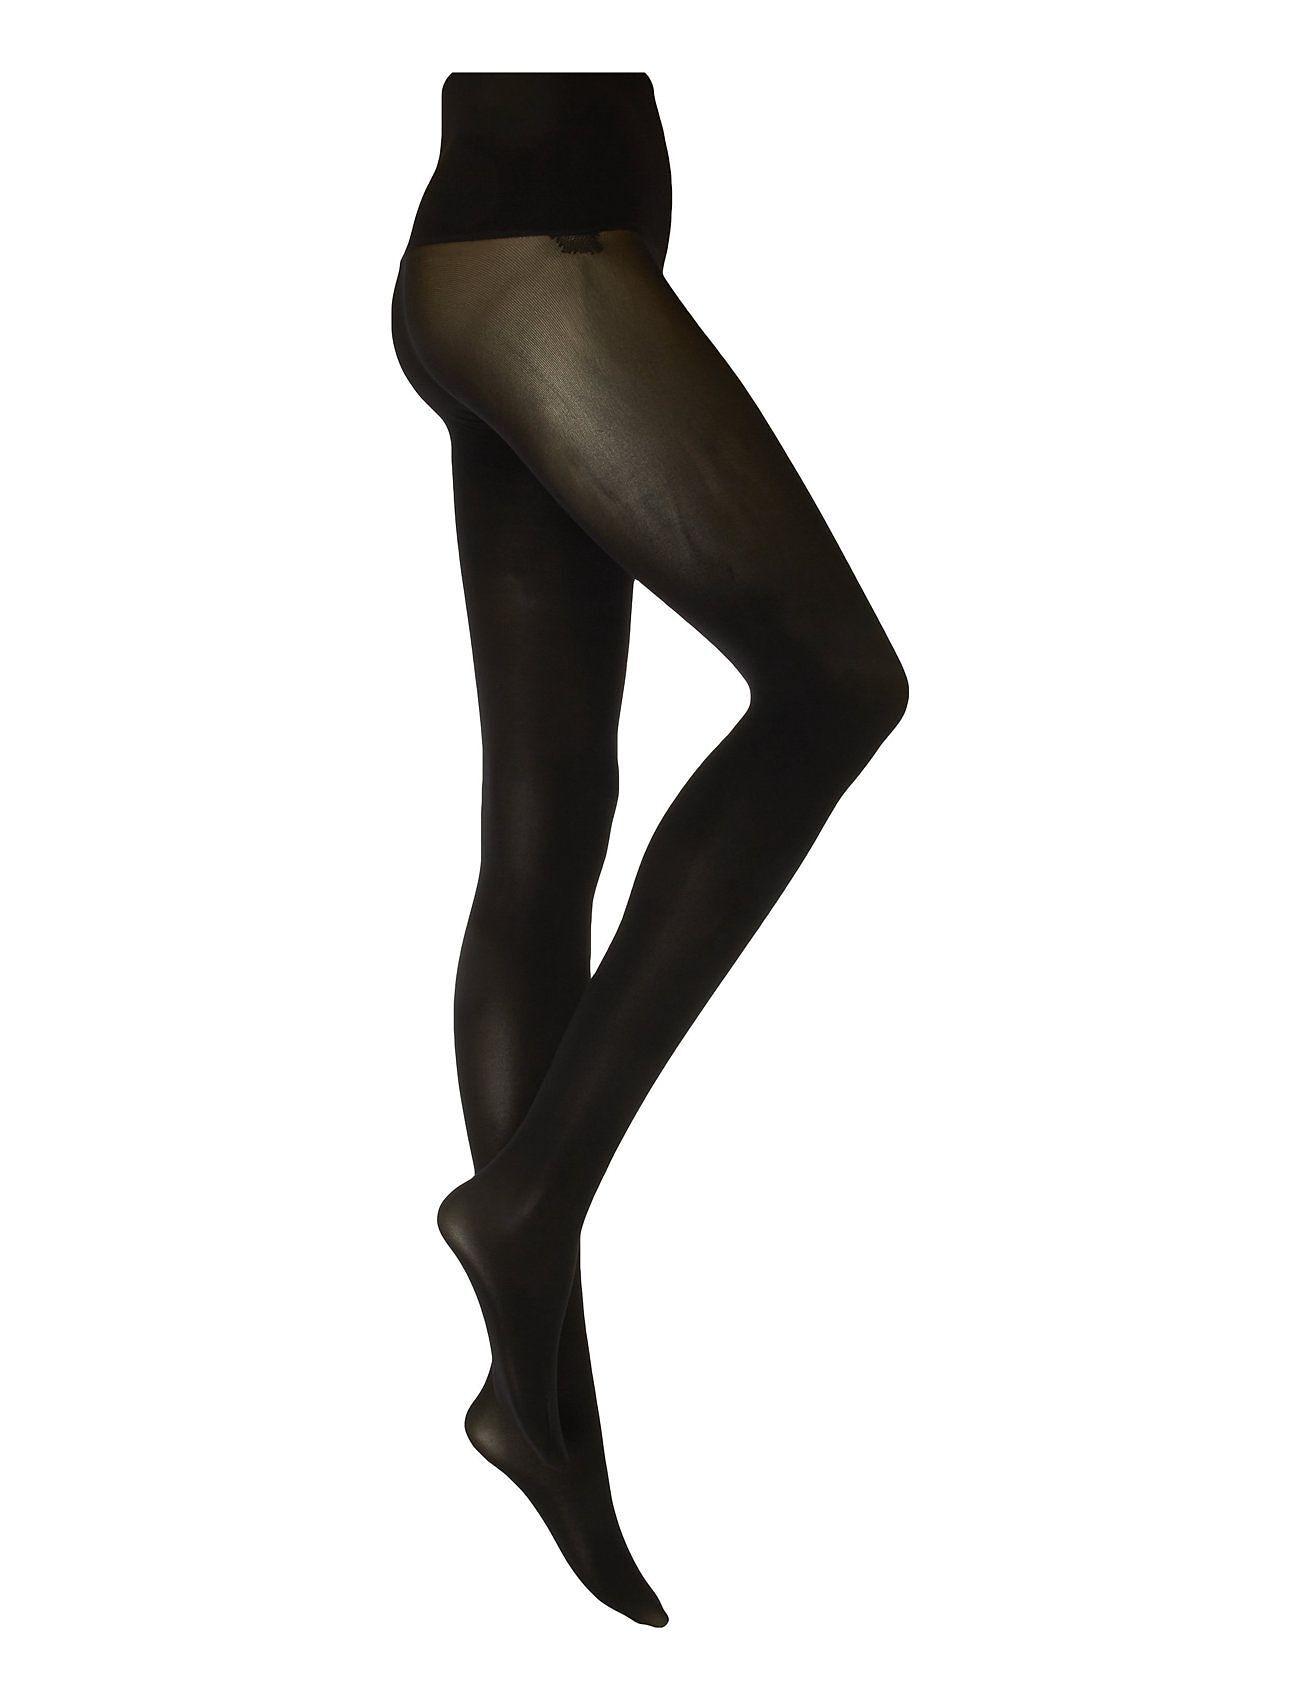 Image of Swedish Stockings Hanna Premium Seamless Tights 40d Sukkahousut Musta